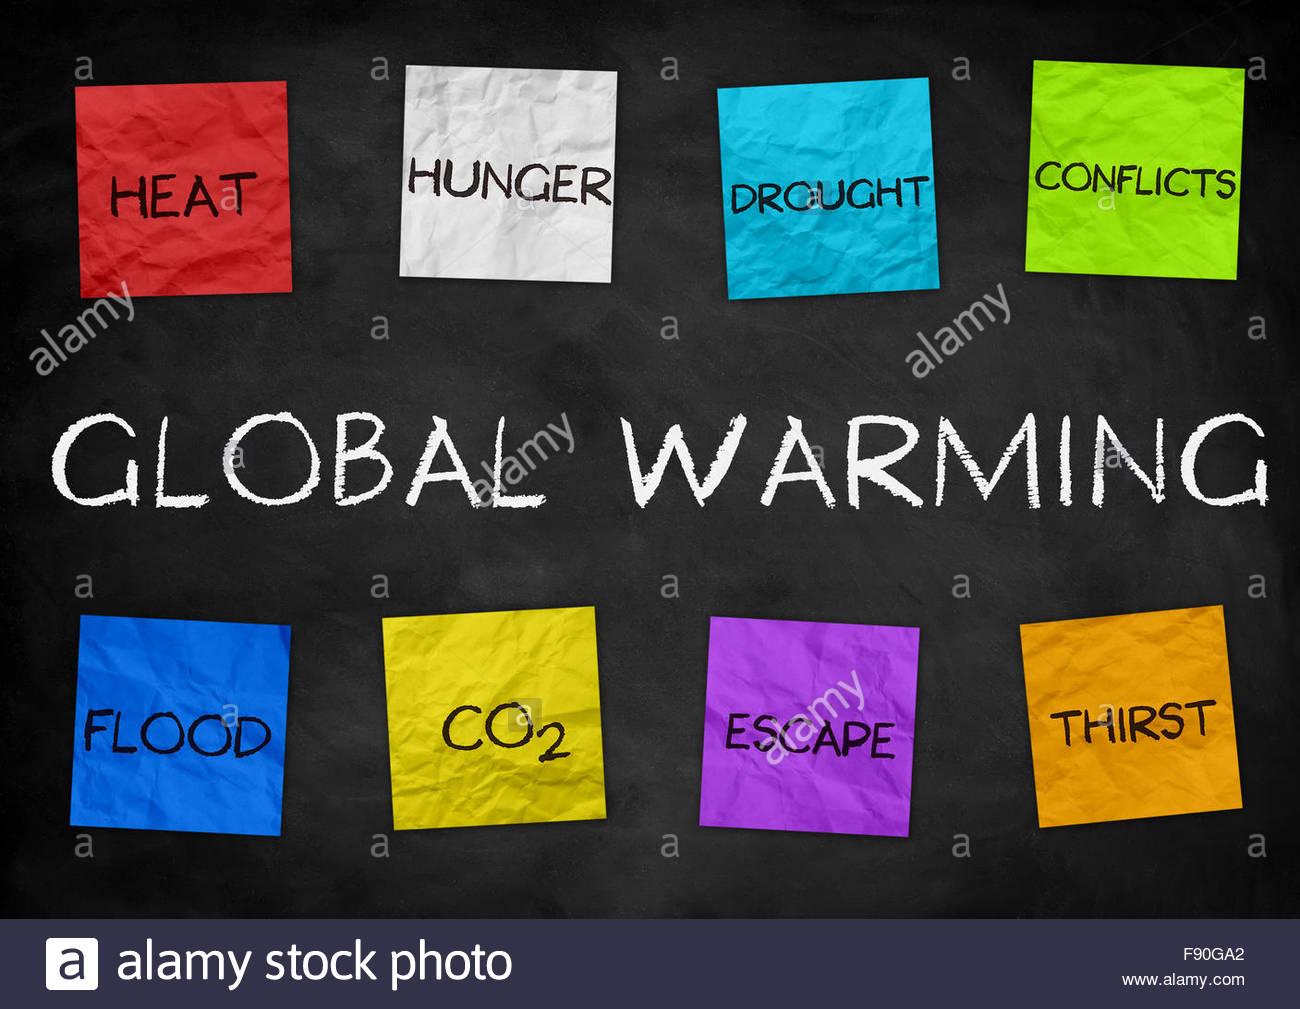 Global Warming - illustration background - Stock Image